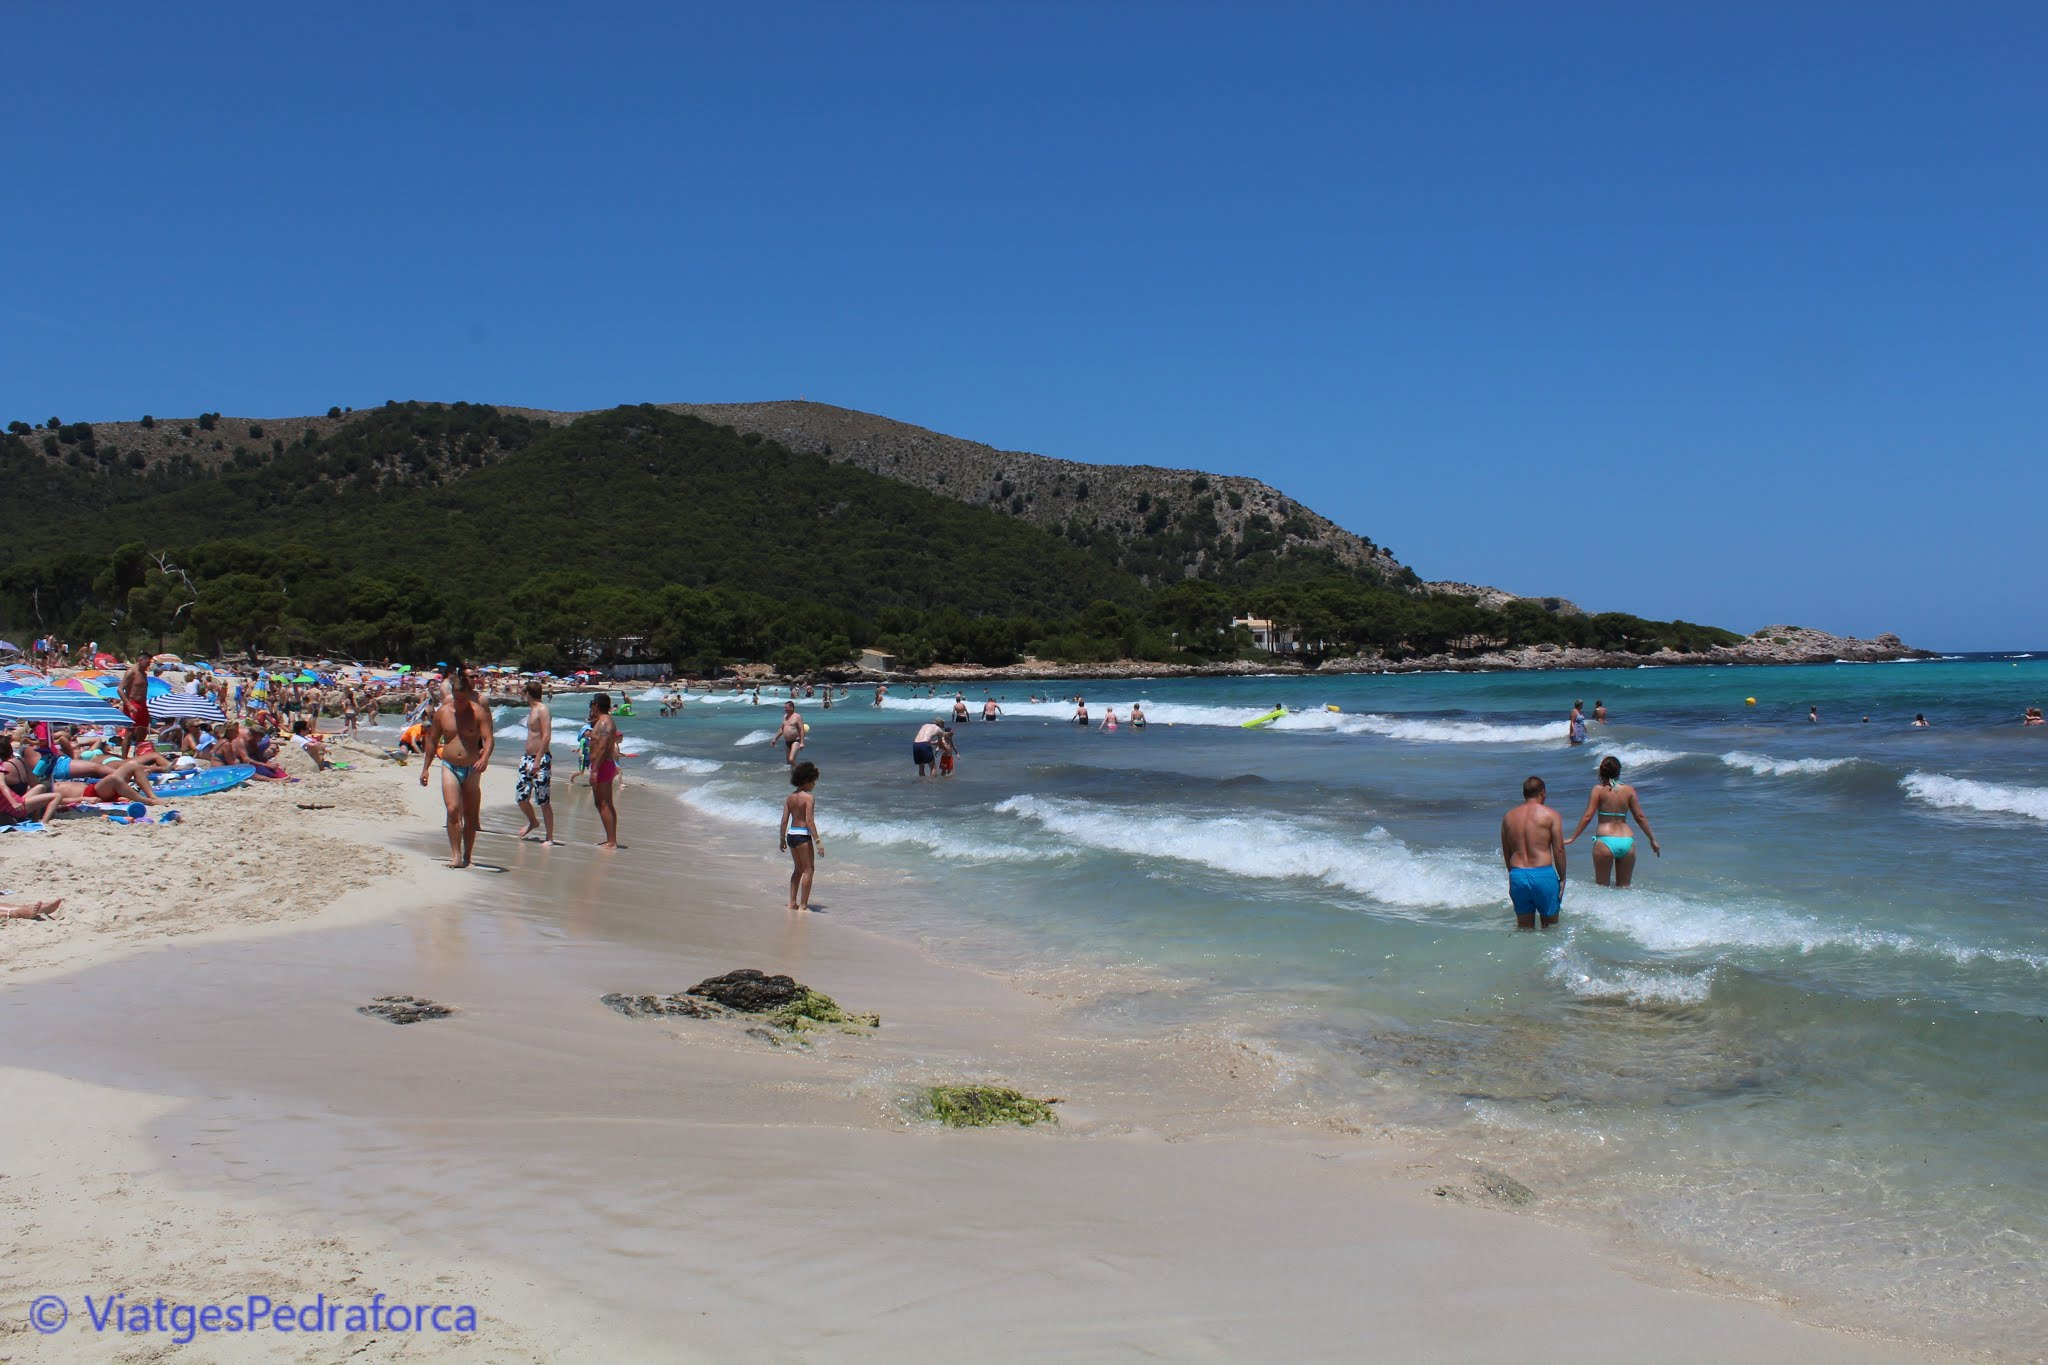 les millors platges de Mallorca, Illes Balears